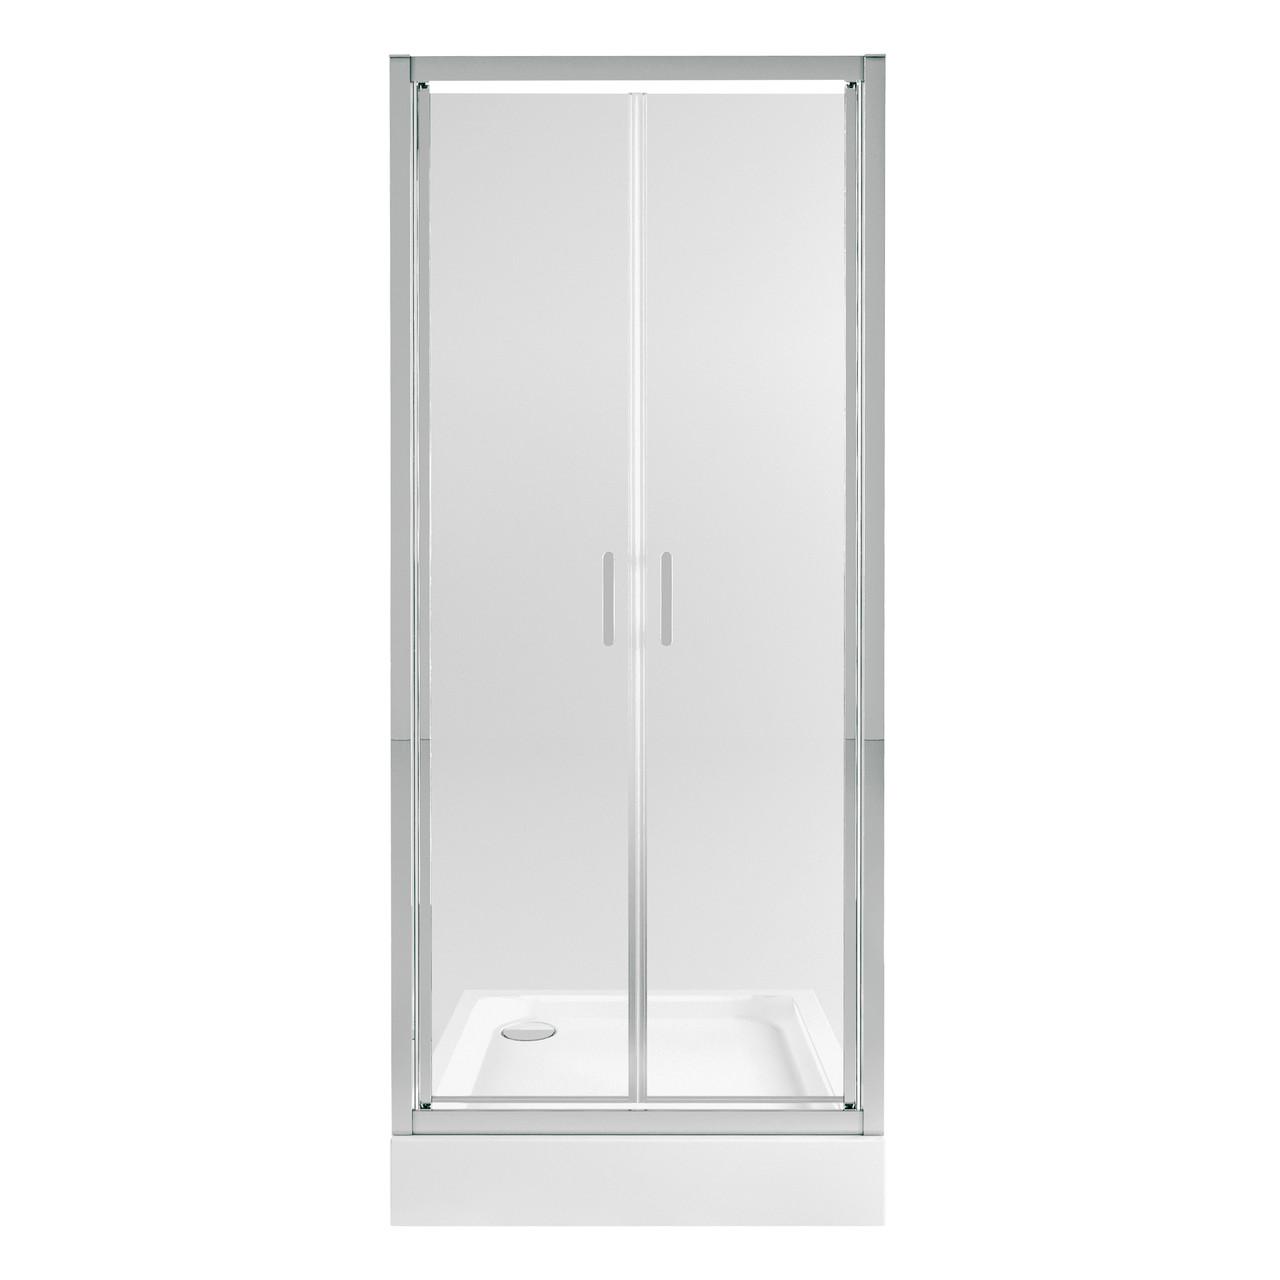 Набор Qtap дверь в нишу Gemini CRM209.C6 90х90 см + поддон Unisquare 309915 с сифоном